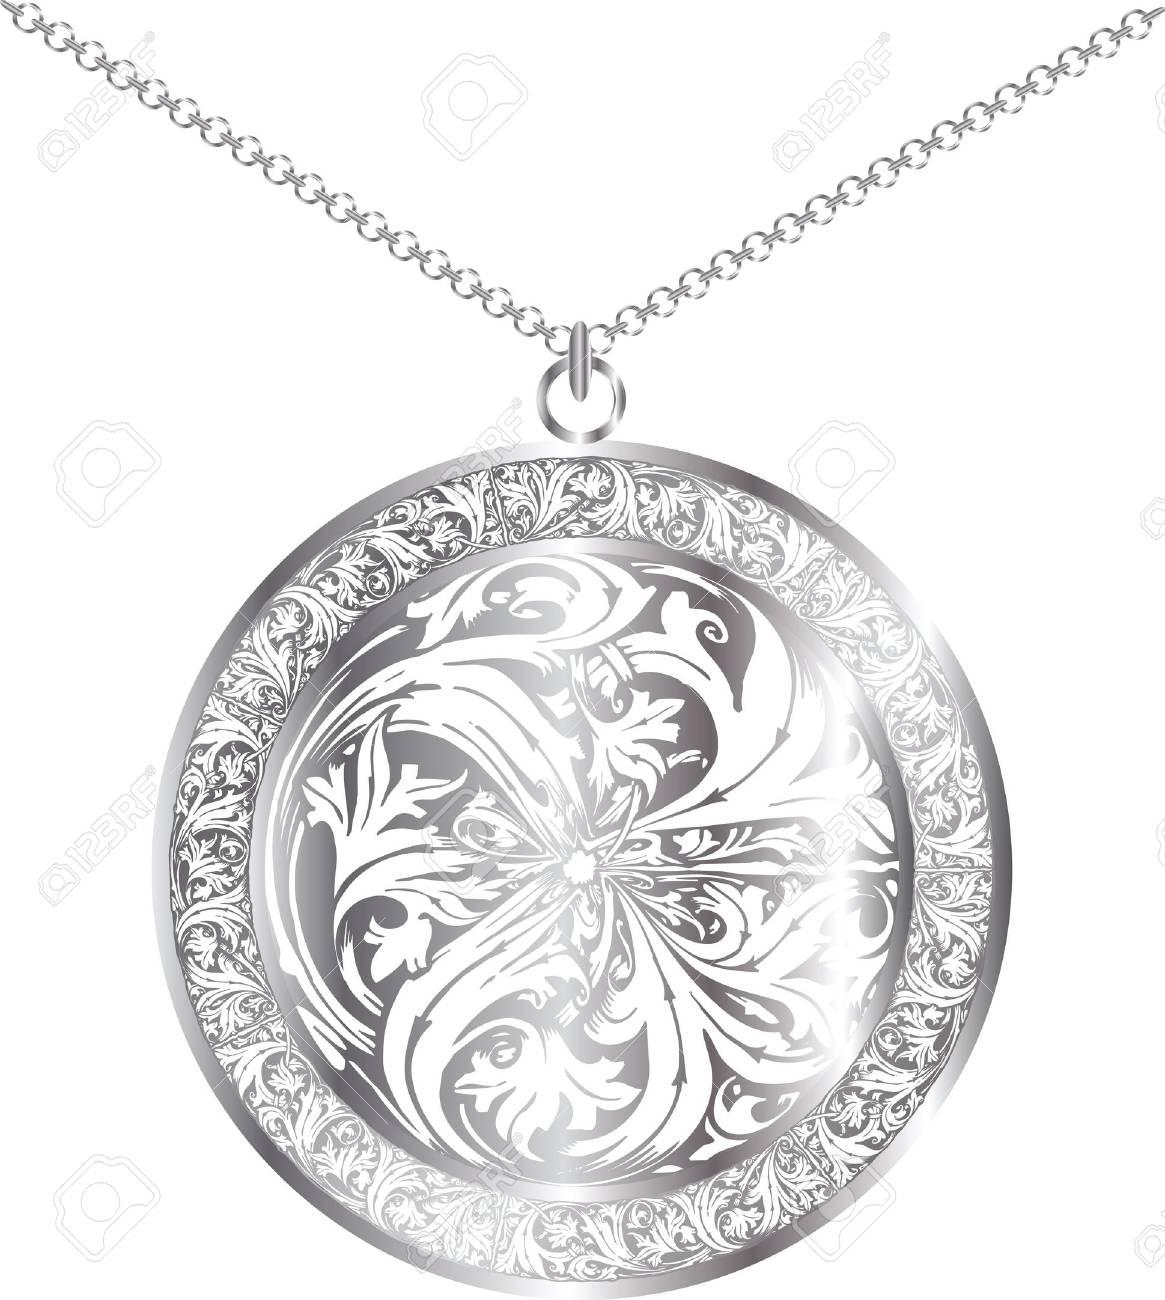 Medallion illustration Stock Vector - 11001088